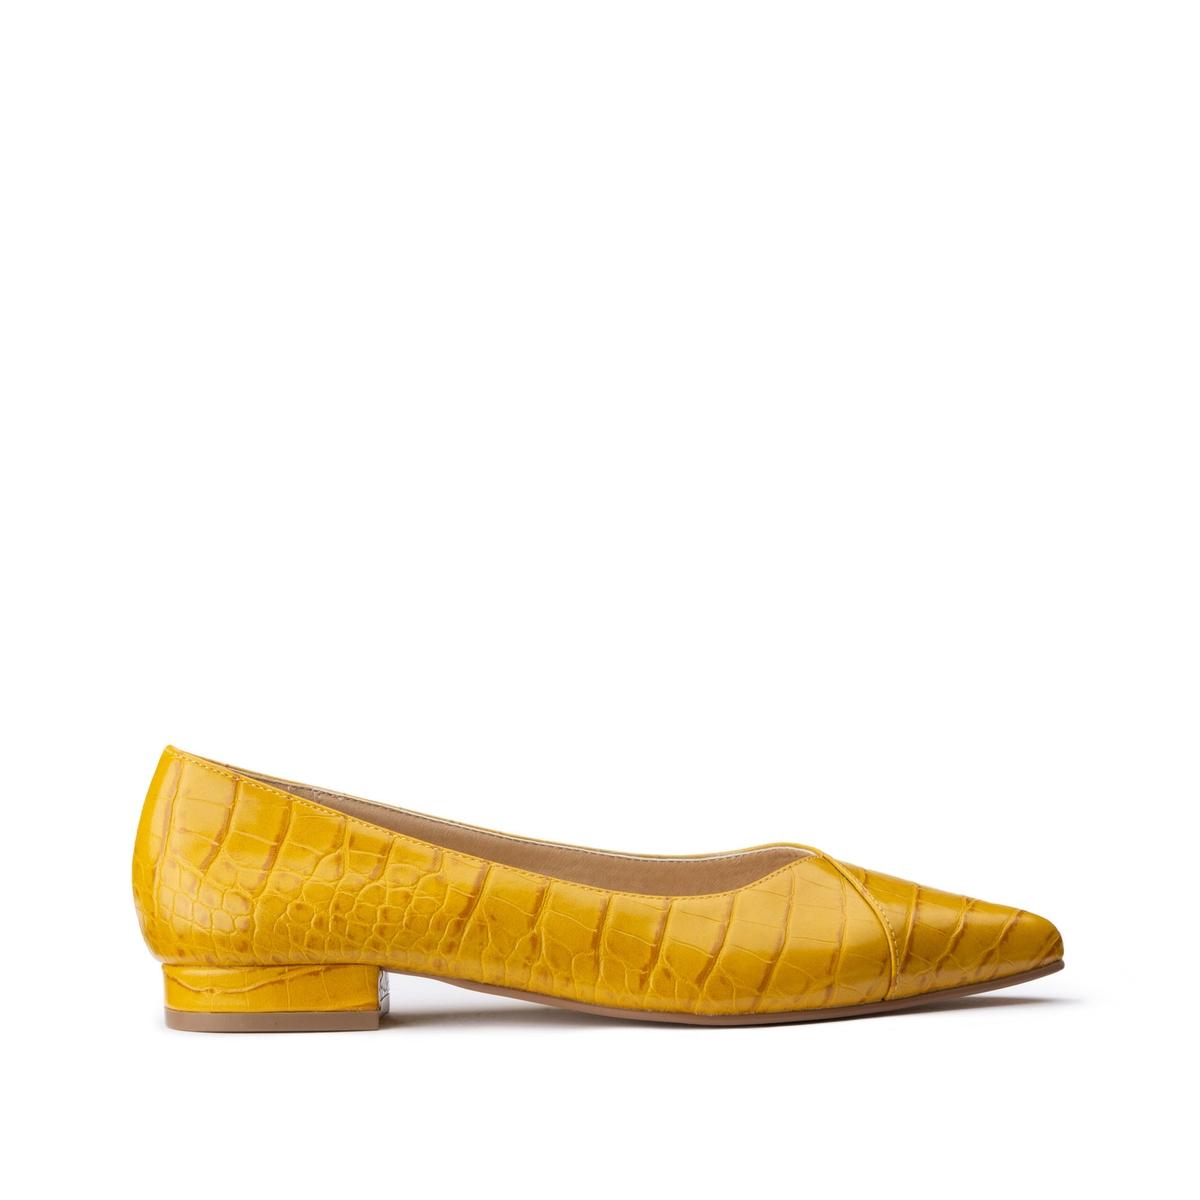 Балетки La Redoute Под кожу крокодила на плоском каблуке 36 желтый ботильоны la redoute на плоском каблуке 36 каштановый